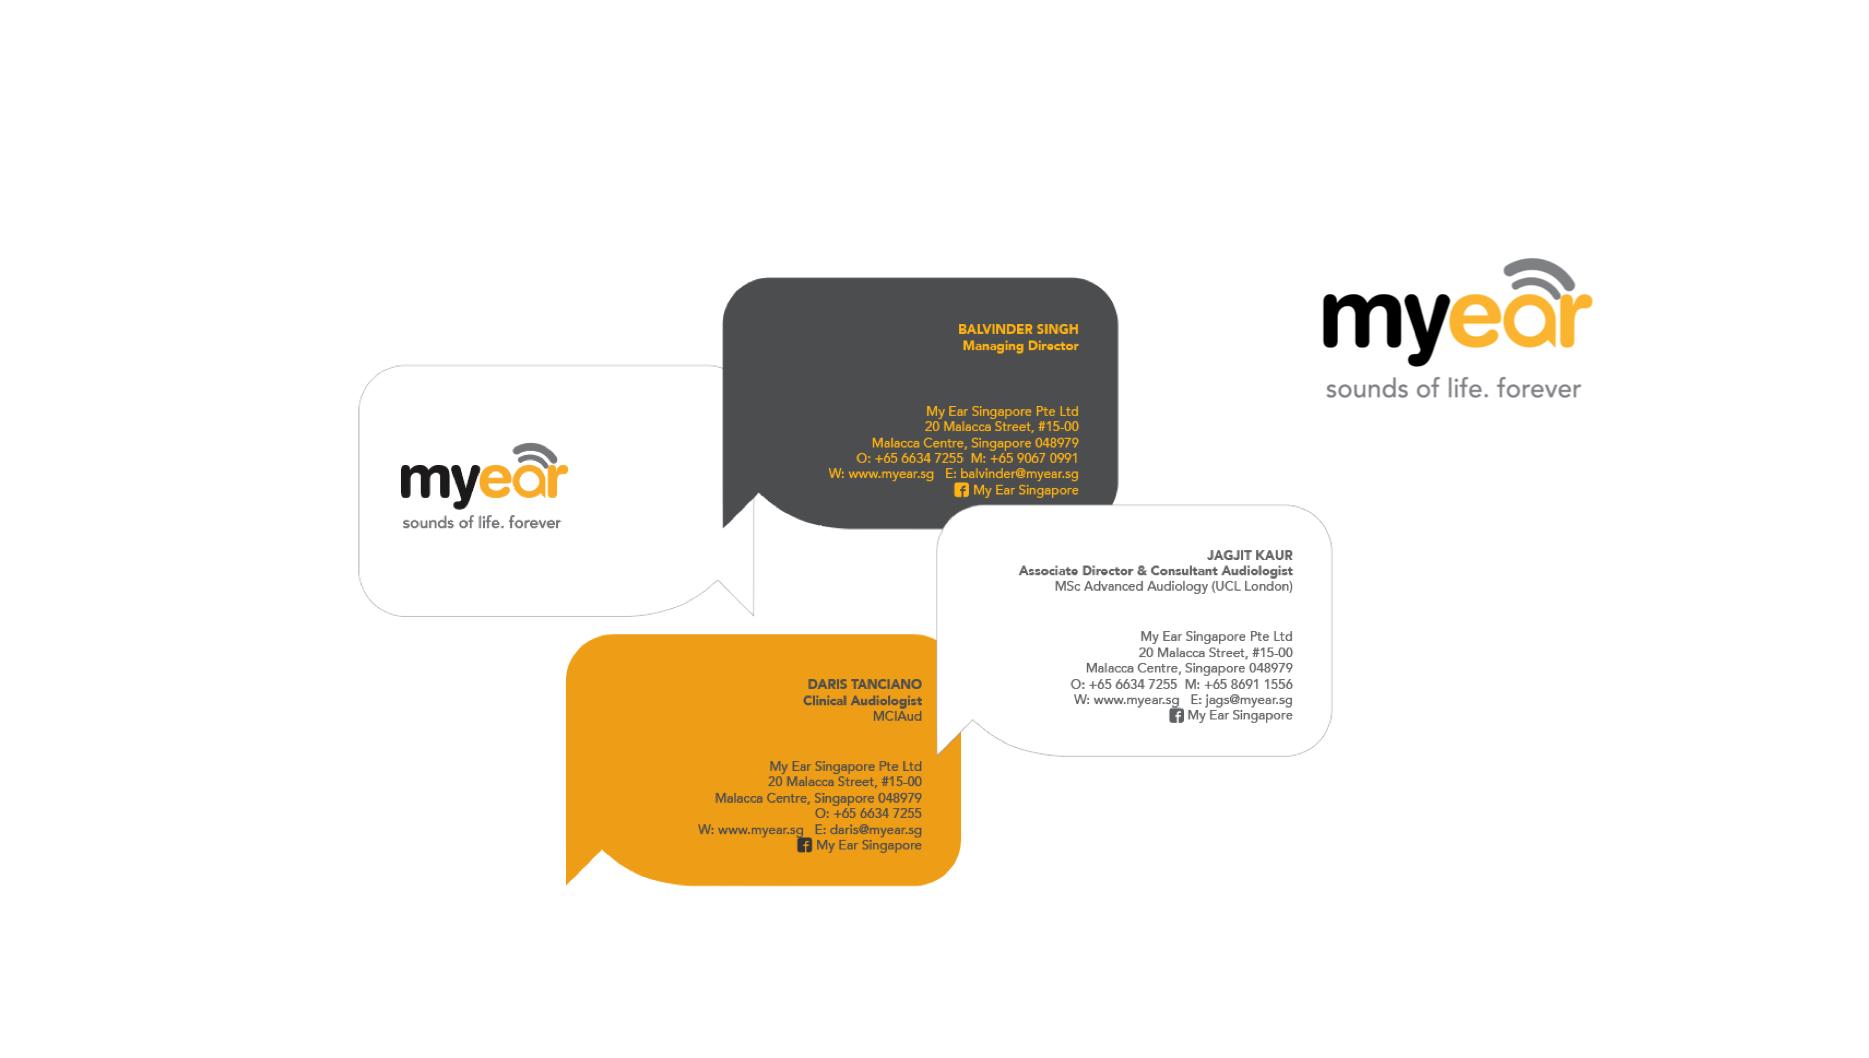 Portfolio – after6 Brand Consultancy